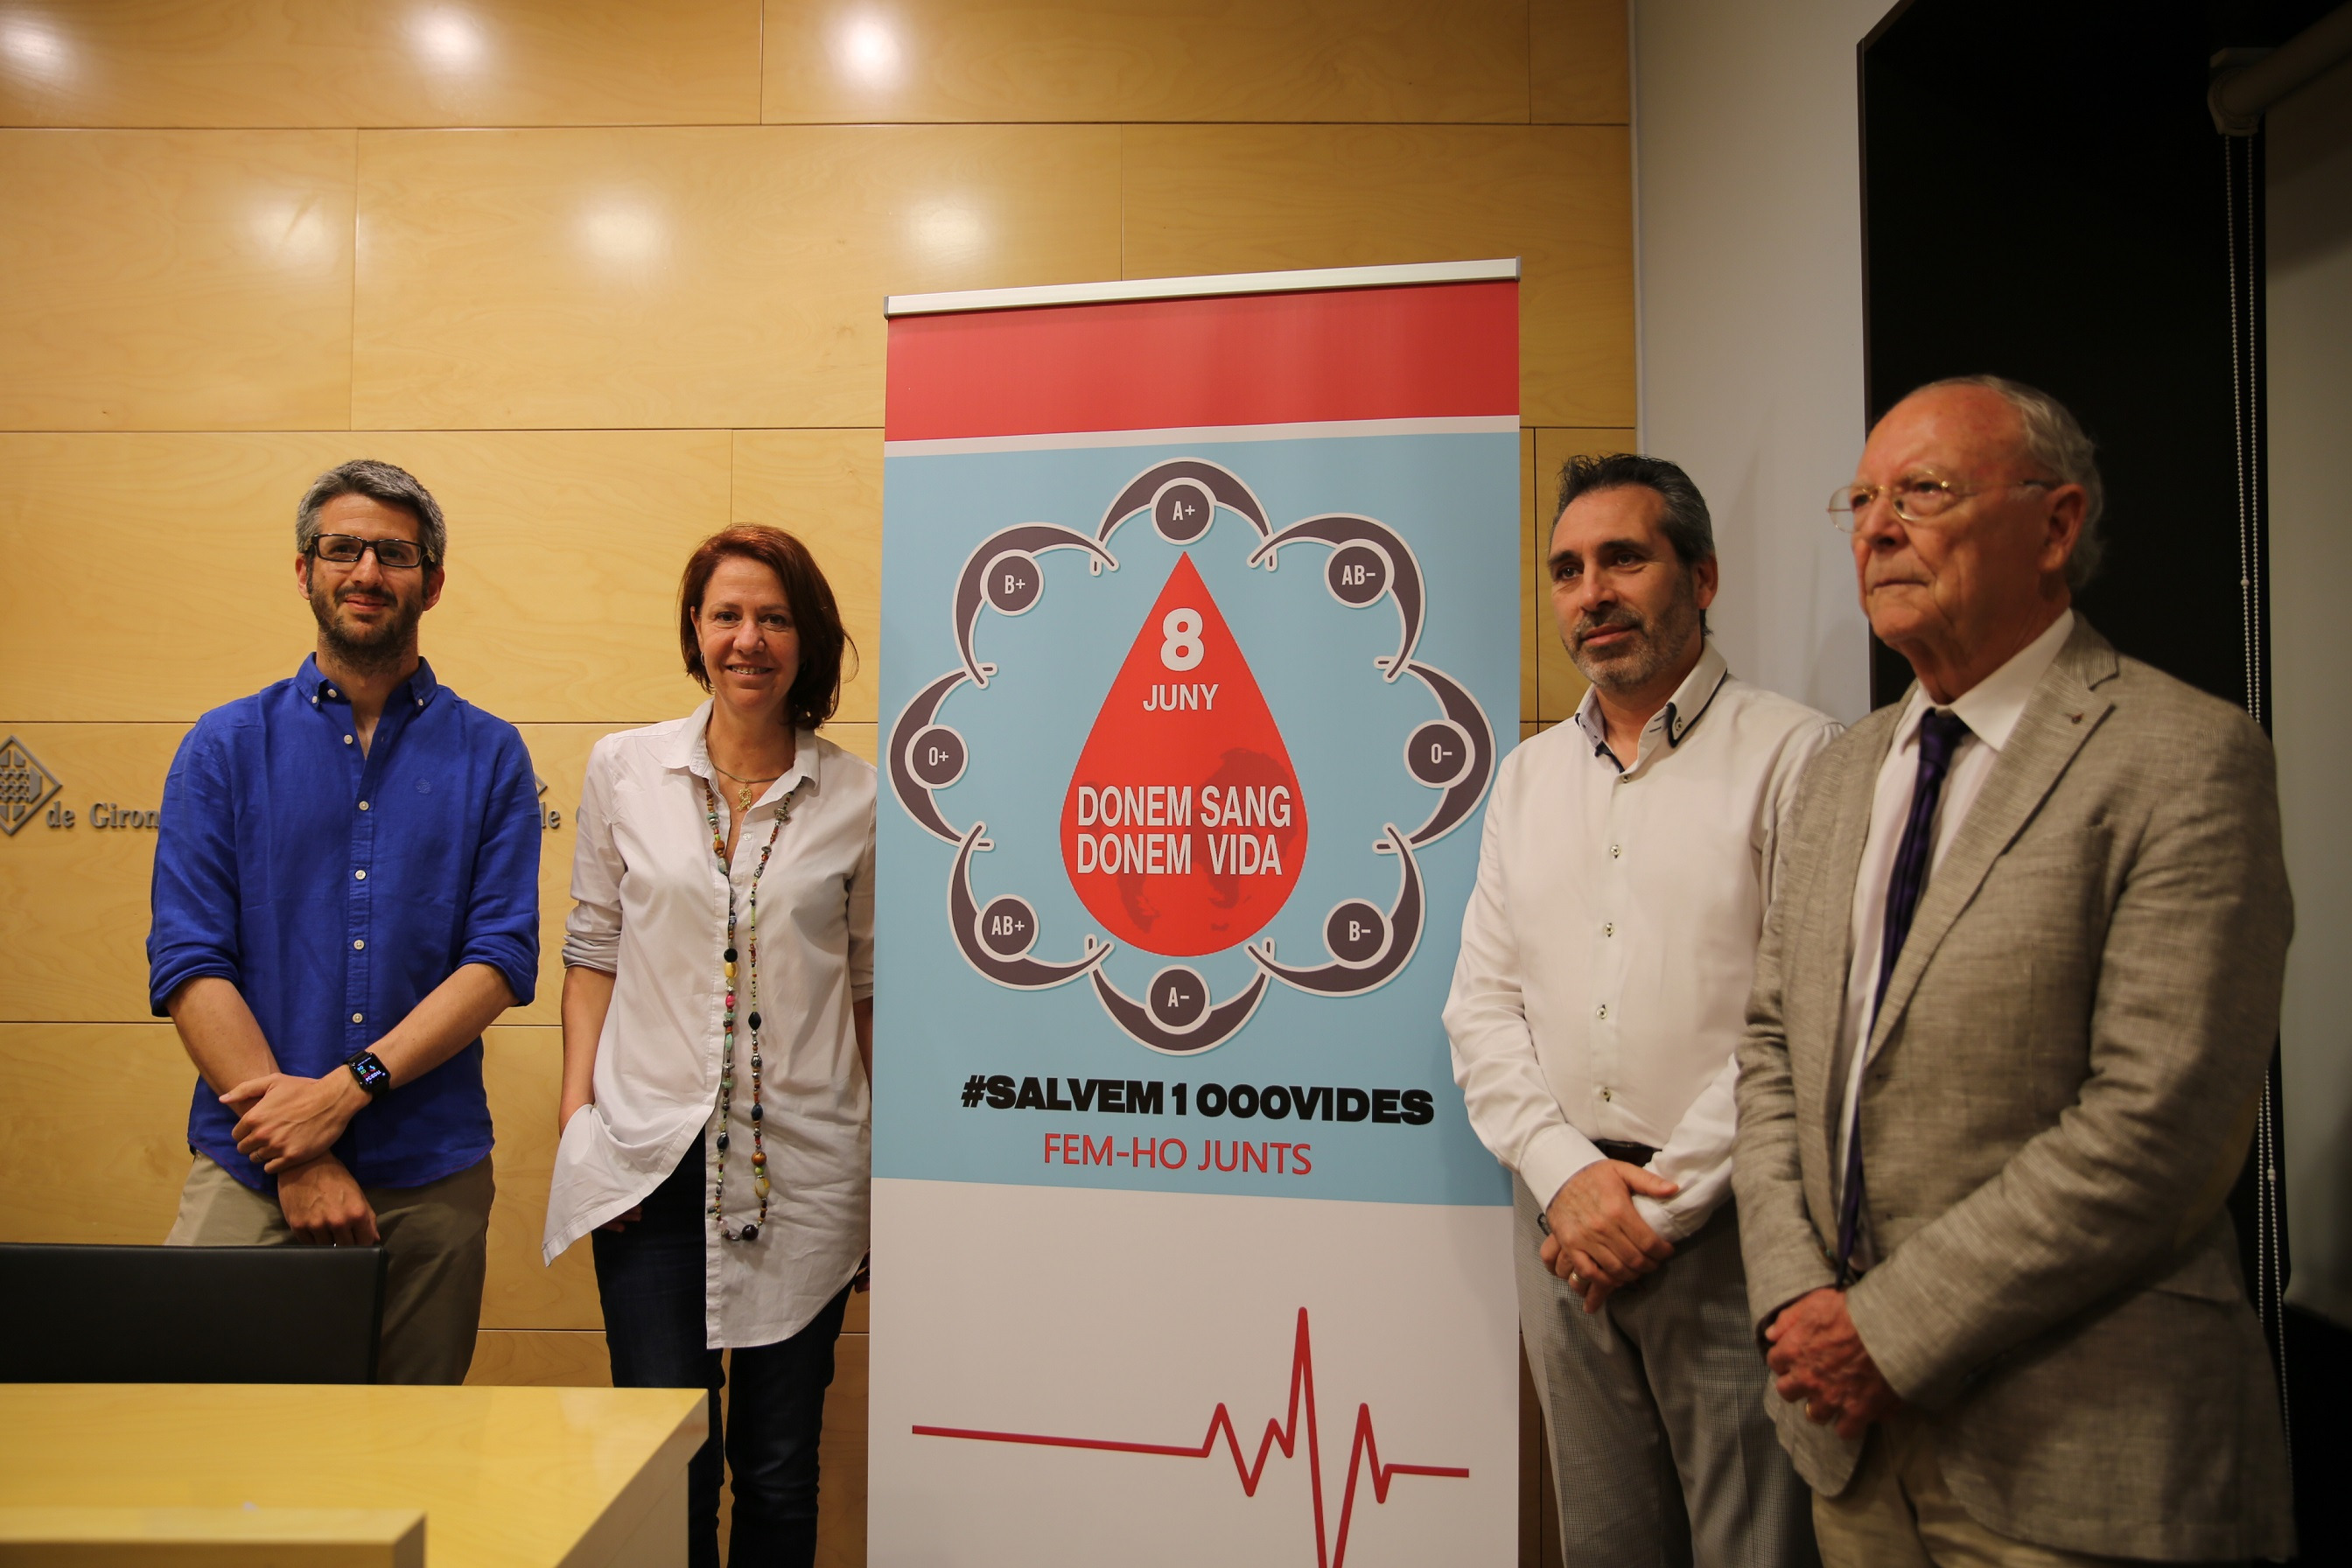 Marta Madrenas presenta la campanya especial de donació de sang del dissabte 8 de juny.